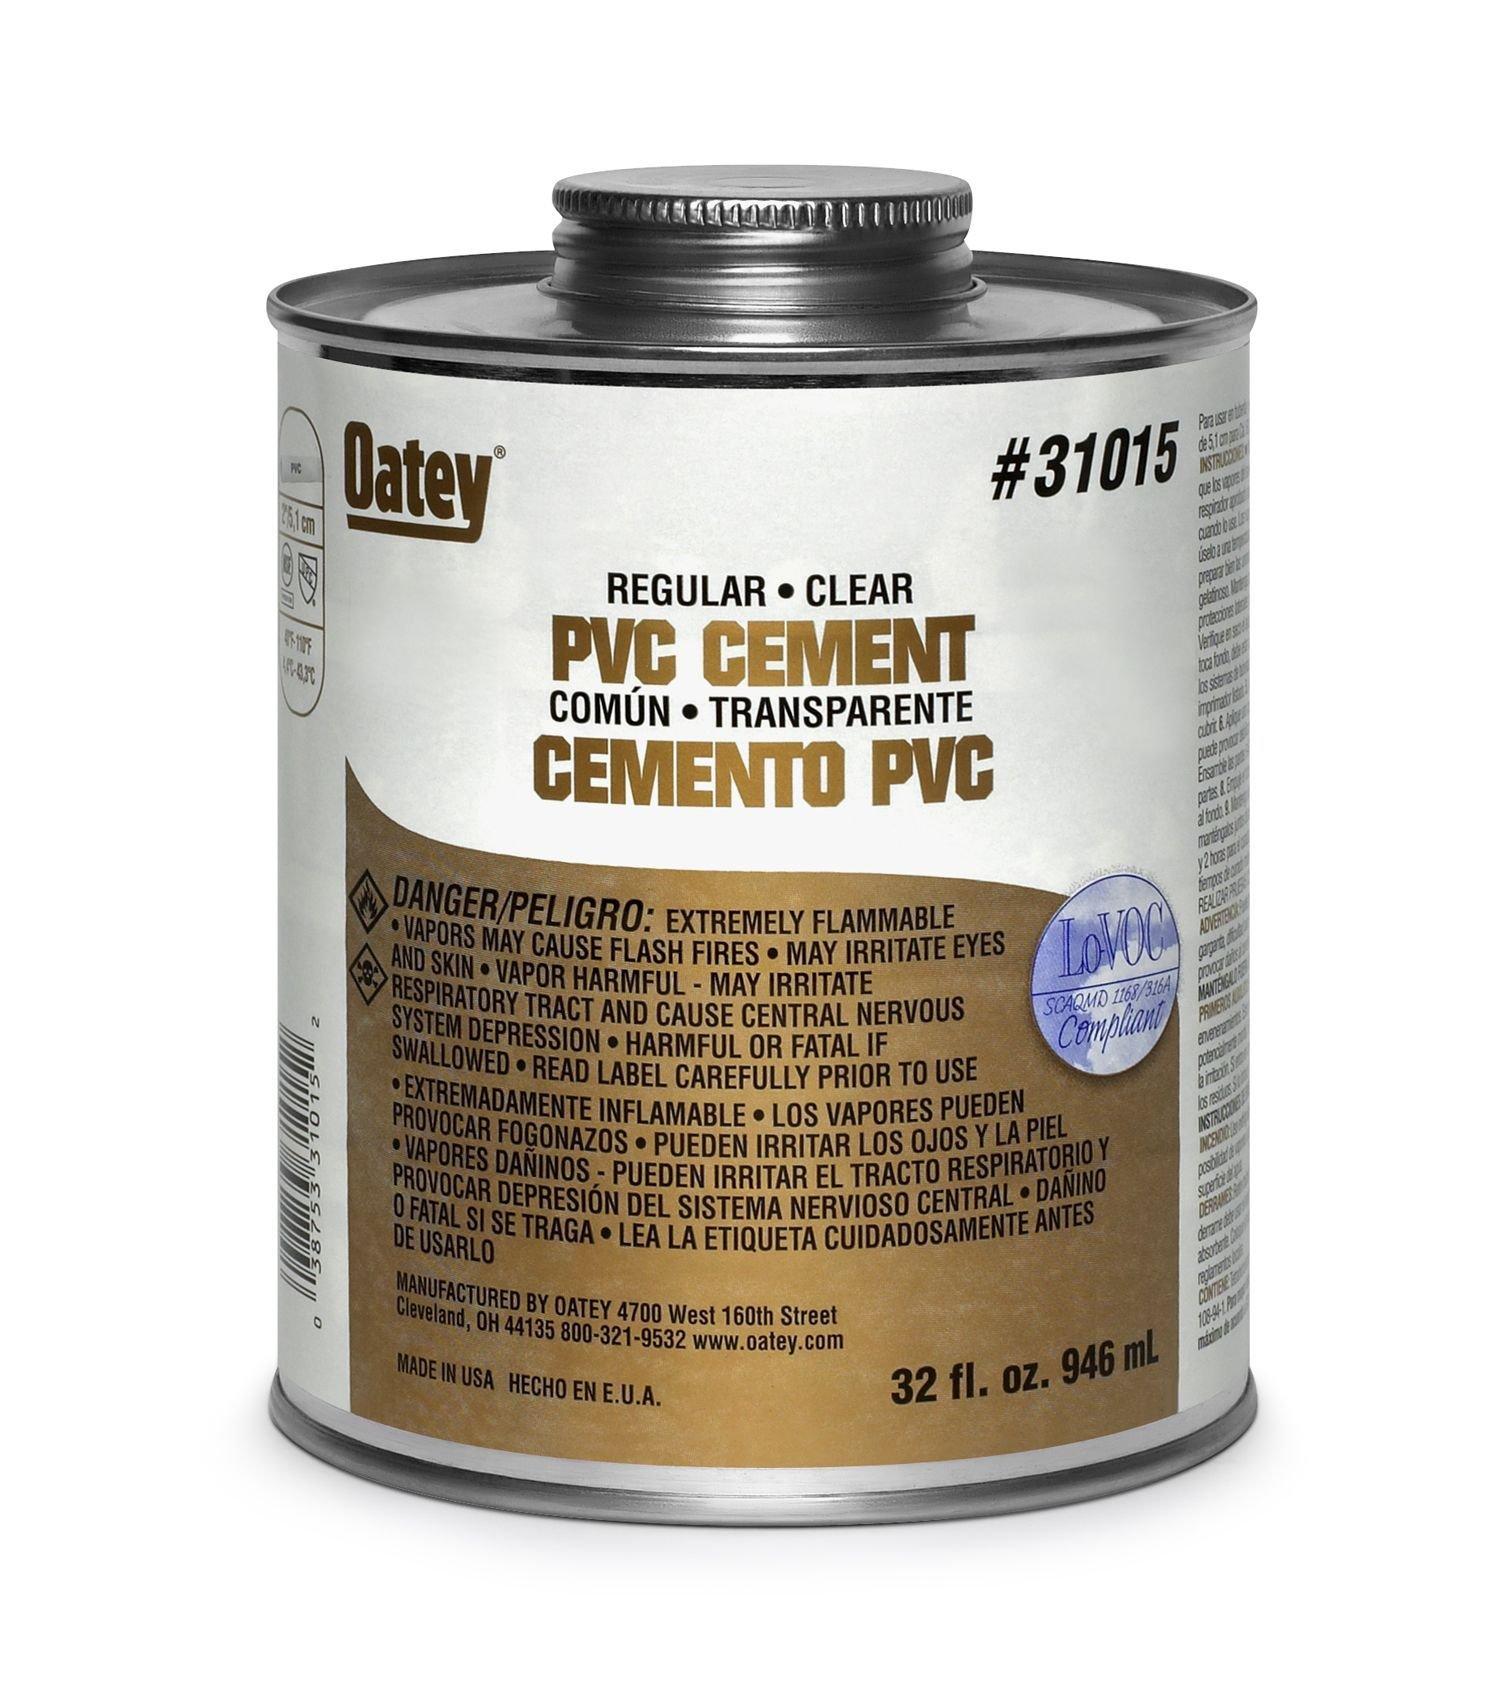 Oatey 31016 PVC Regular Cement, Clear, Gallon